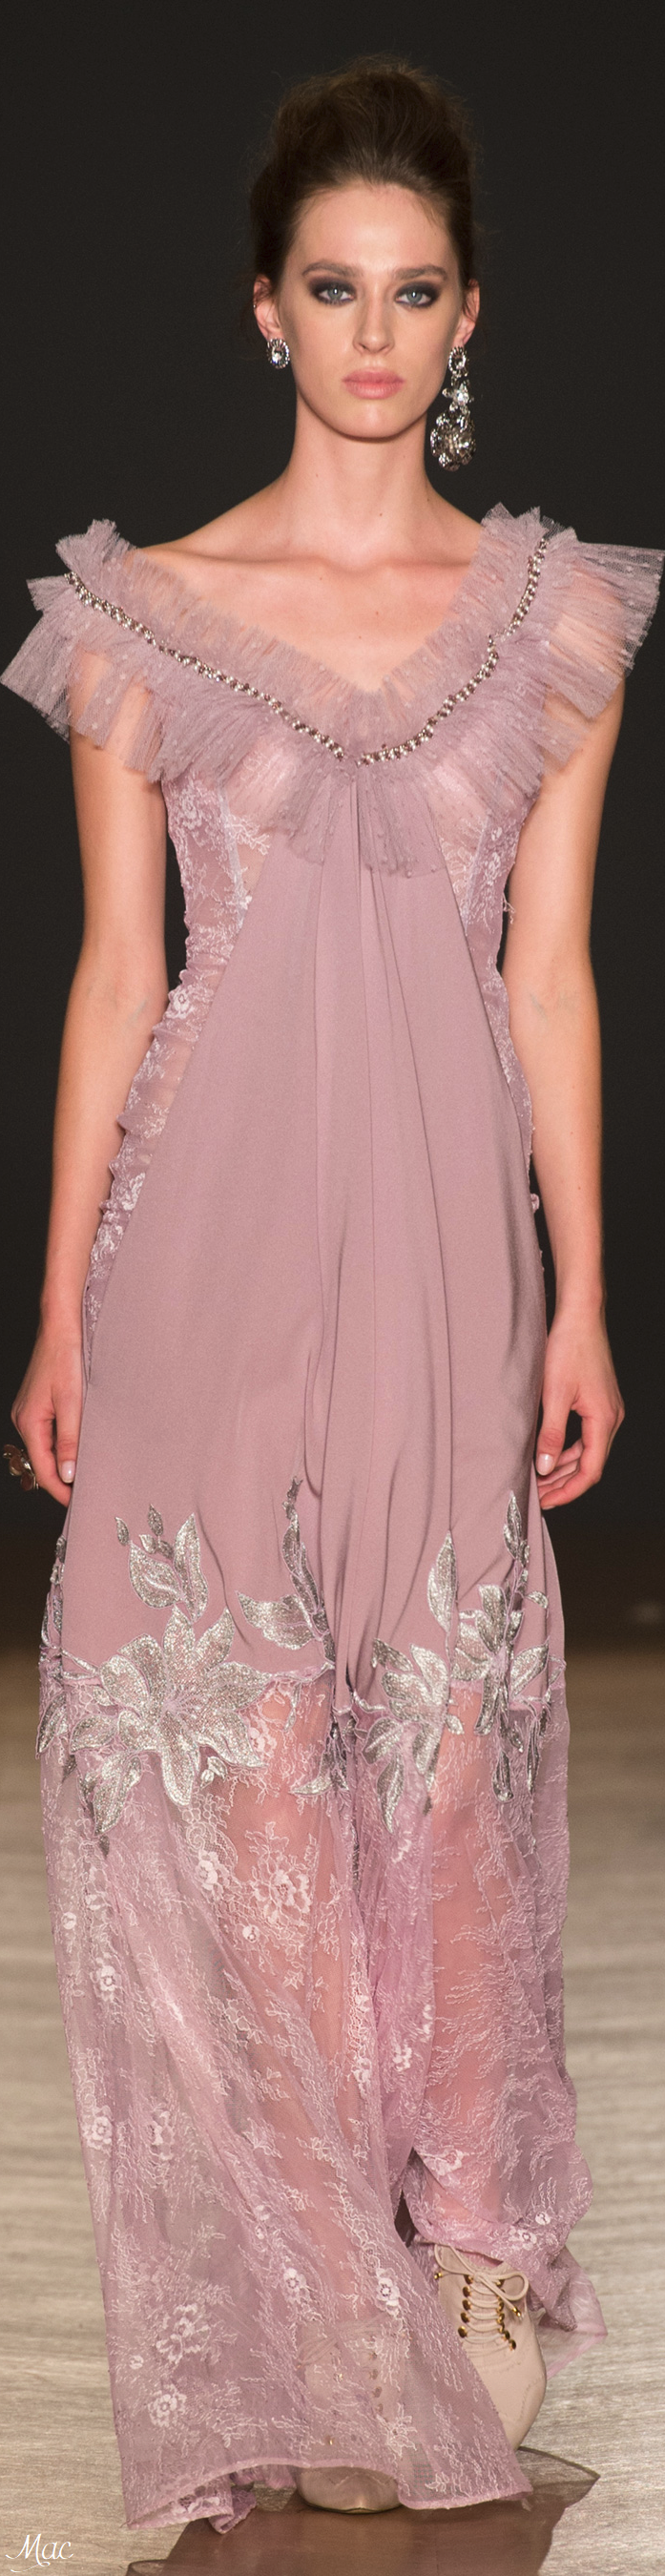 Fall 2017 Haute Couture Dany Atrache | Clothes Designs | Pinterest ...